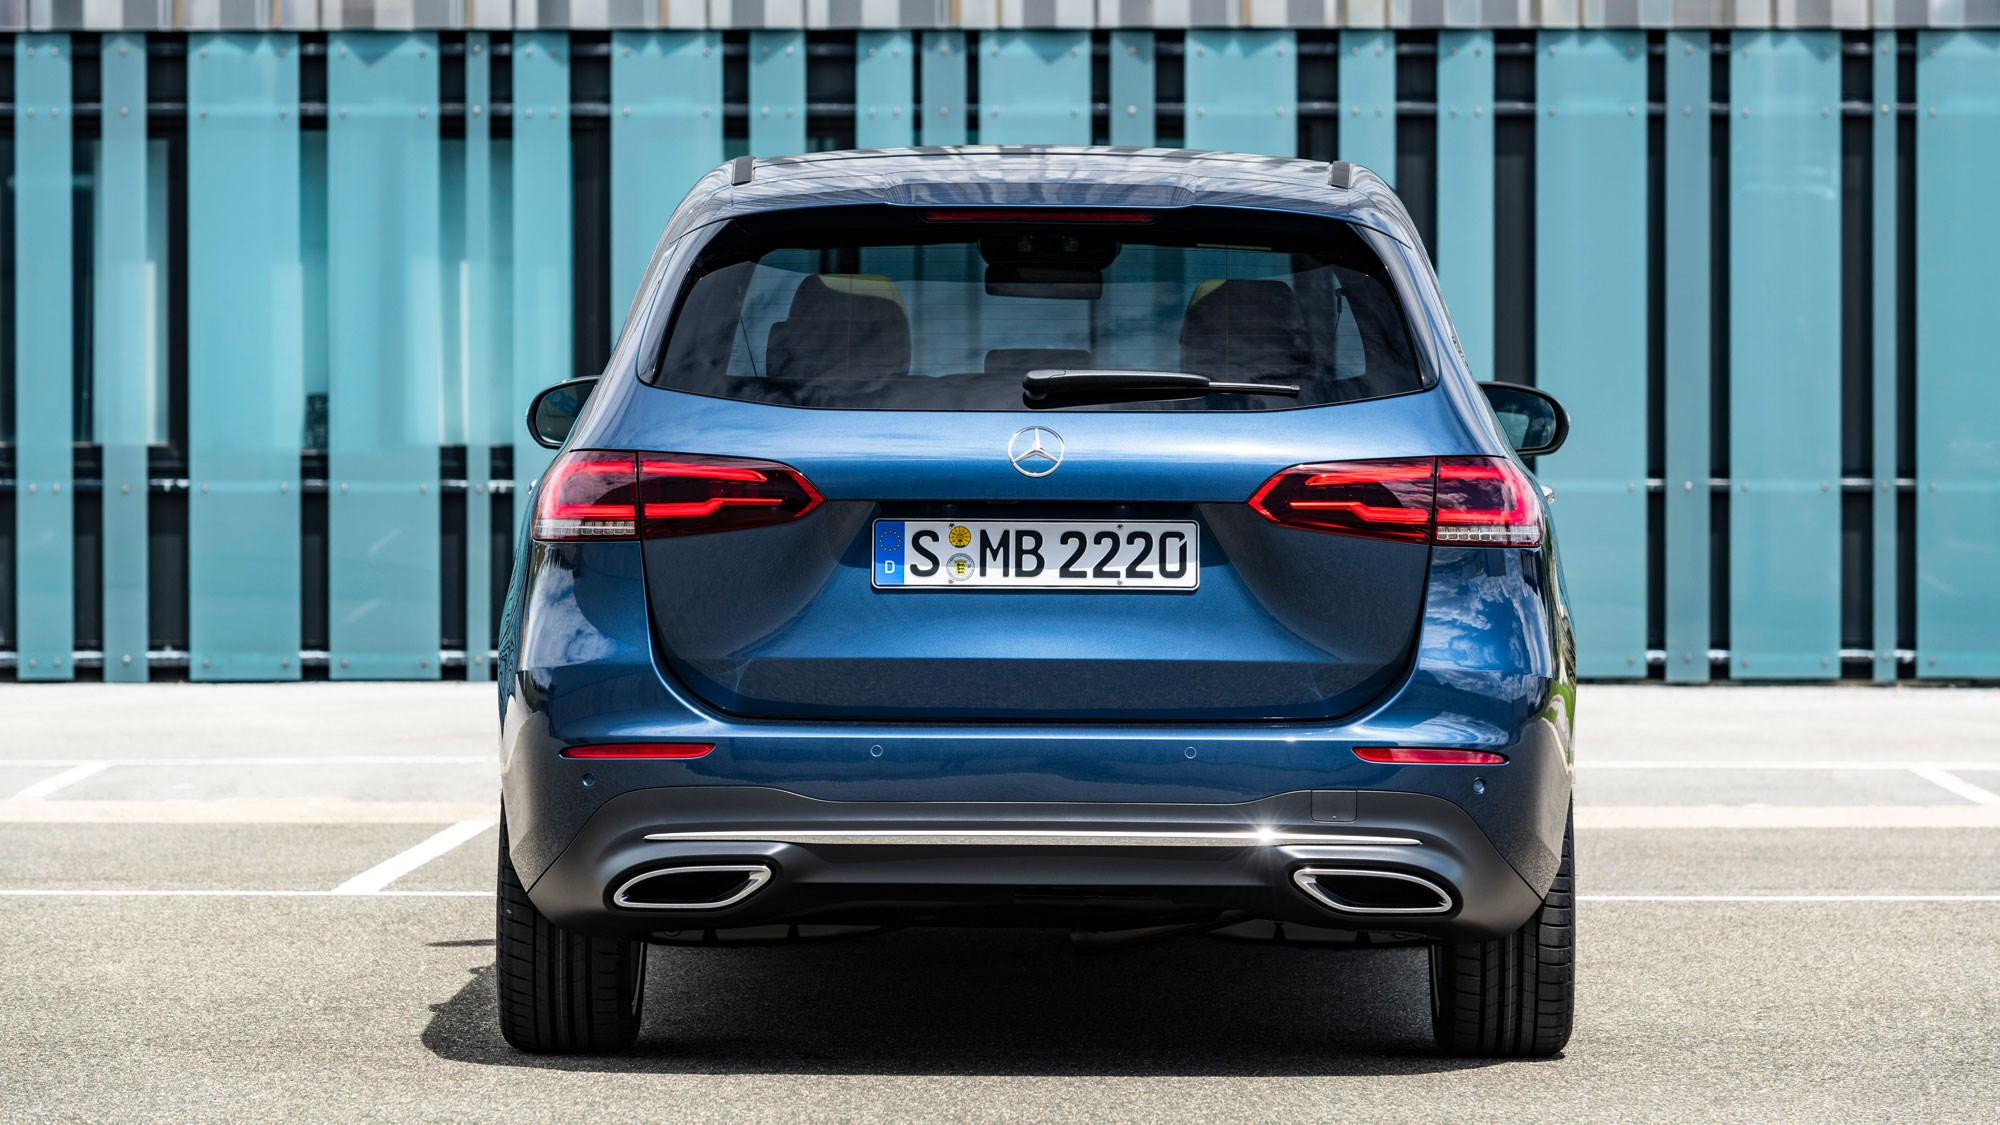 New Mercedes B Class The Mpv To Take On Suvs Car Magazine